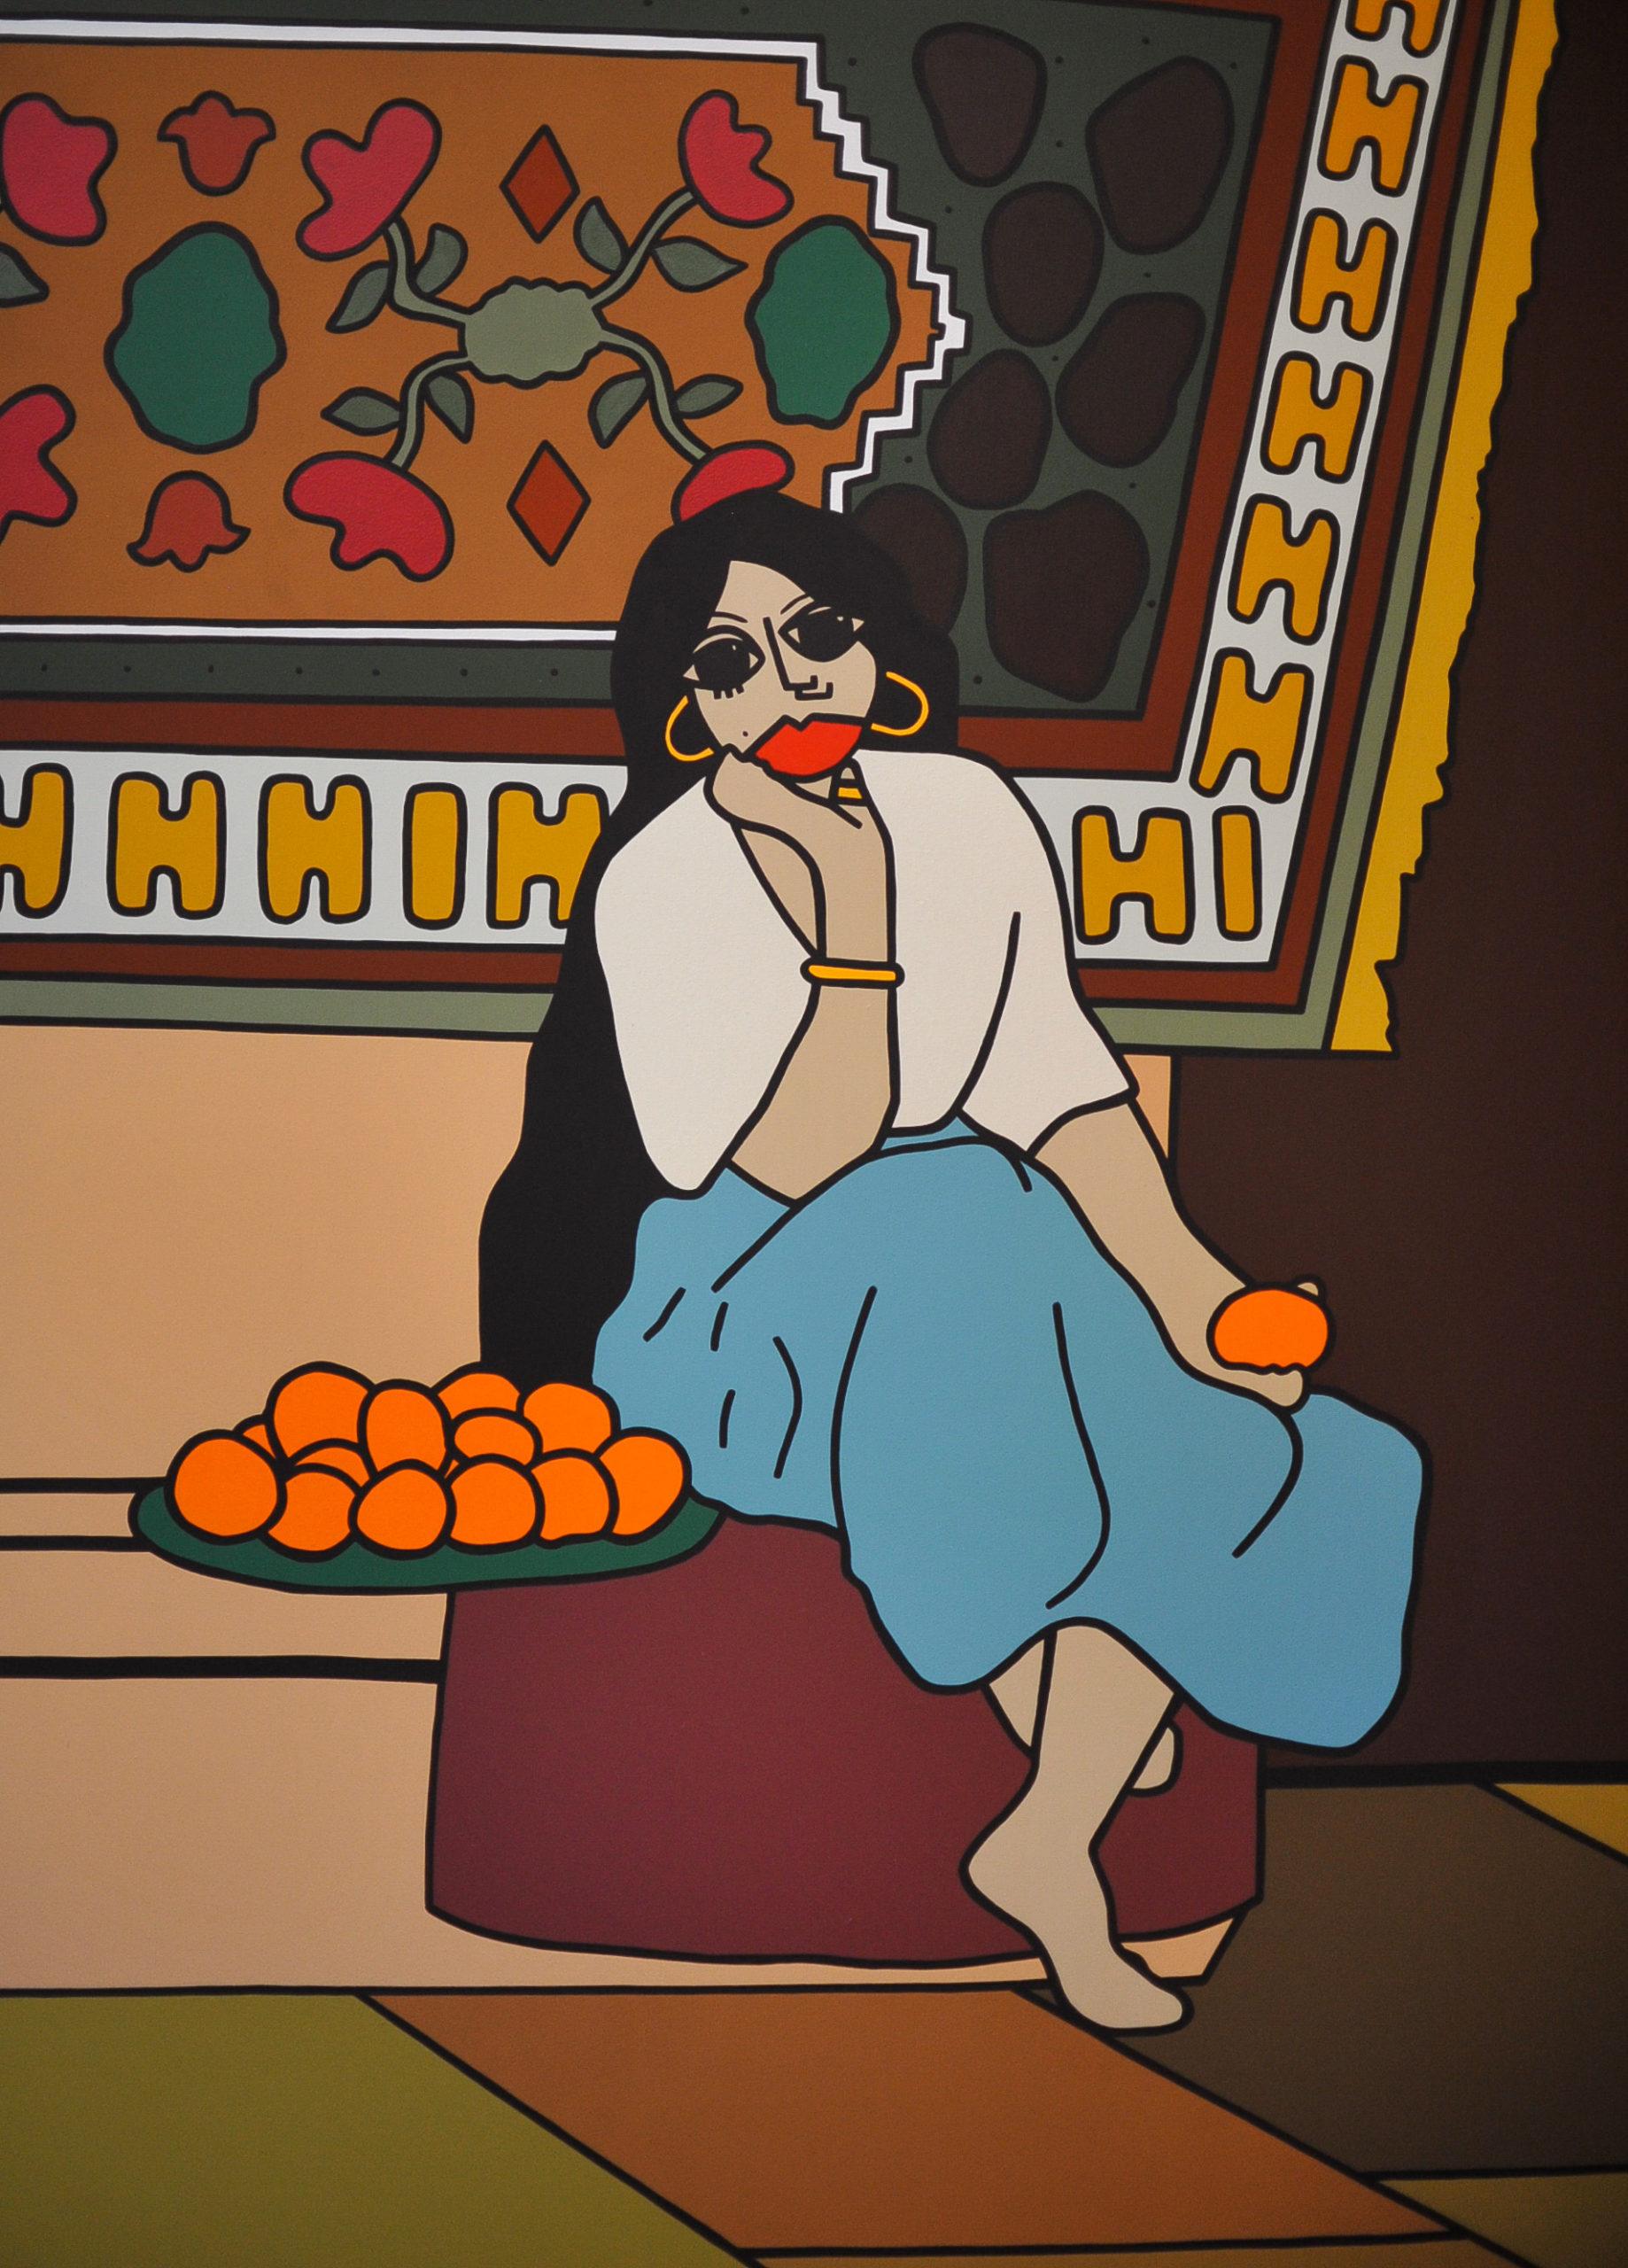 RedLips; nouvelle figuration; marseille; art marseille; follow your dreams; artiste marseillaise; nouveau talent artistique ; modigliani ; matisse; paula becker follow-your-dreams.fr; olivier barriol ; david pluskwa